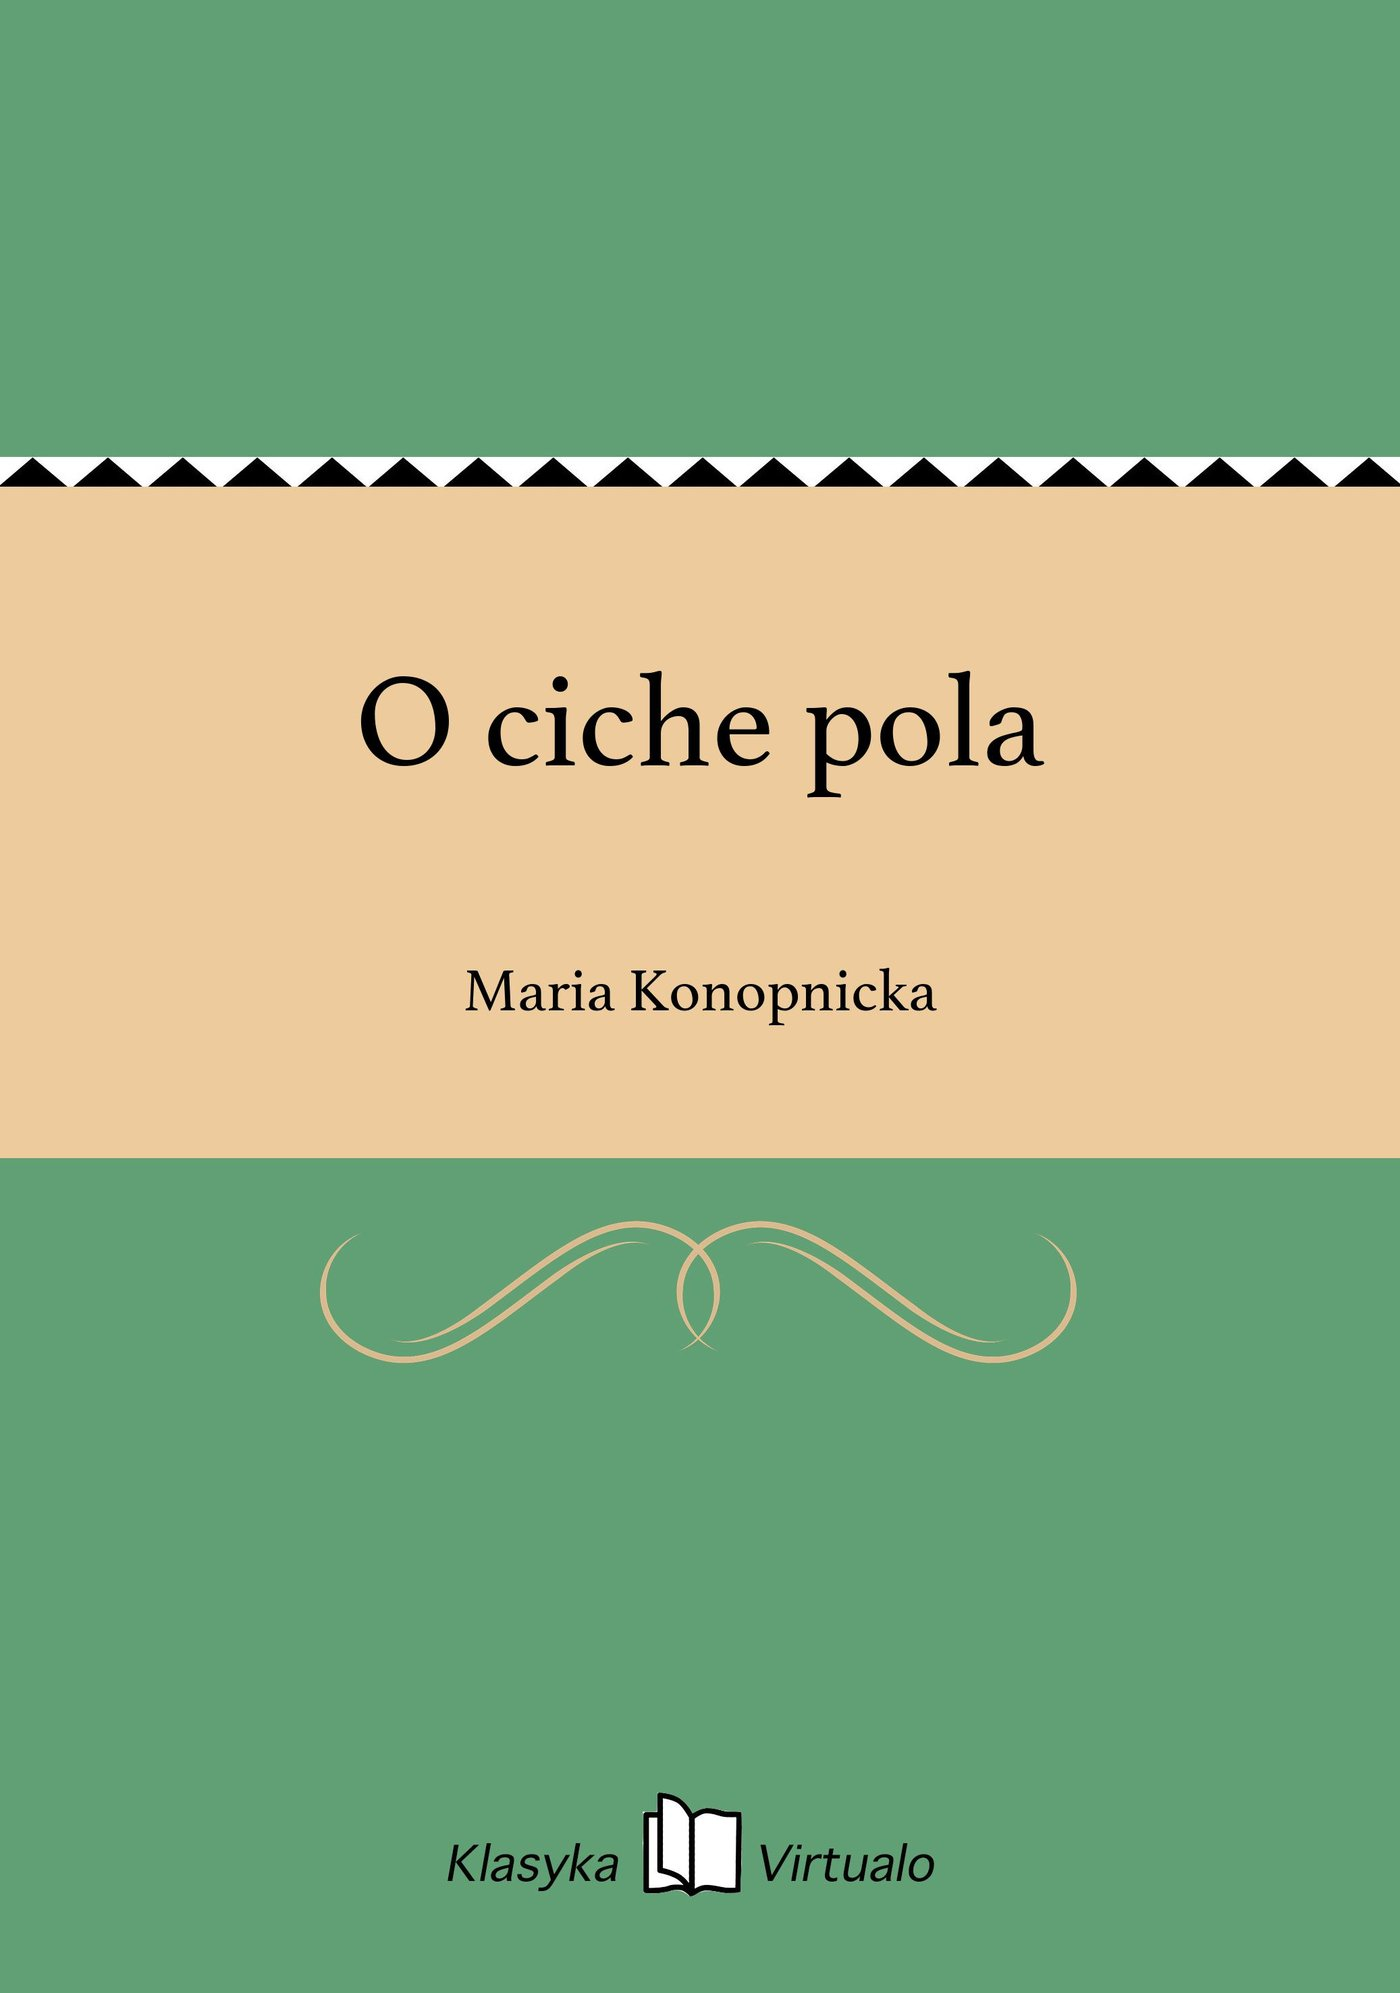 O ciche pola - Ebook (Książka EPUB) do pobrania w formacie EPUB